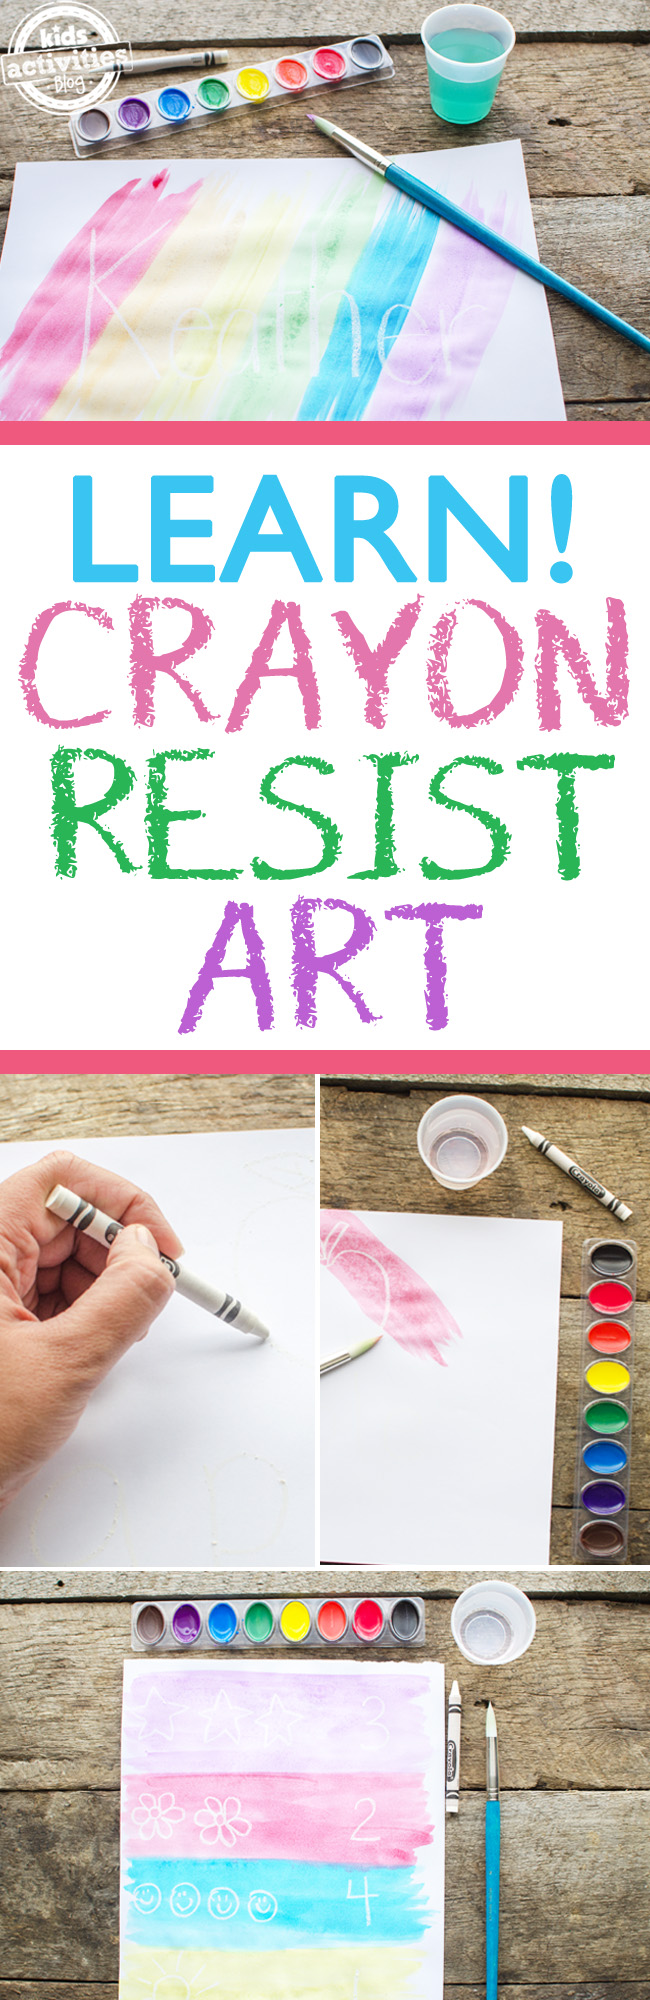 kids crayon resist art